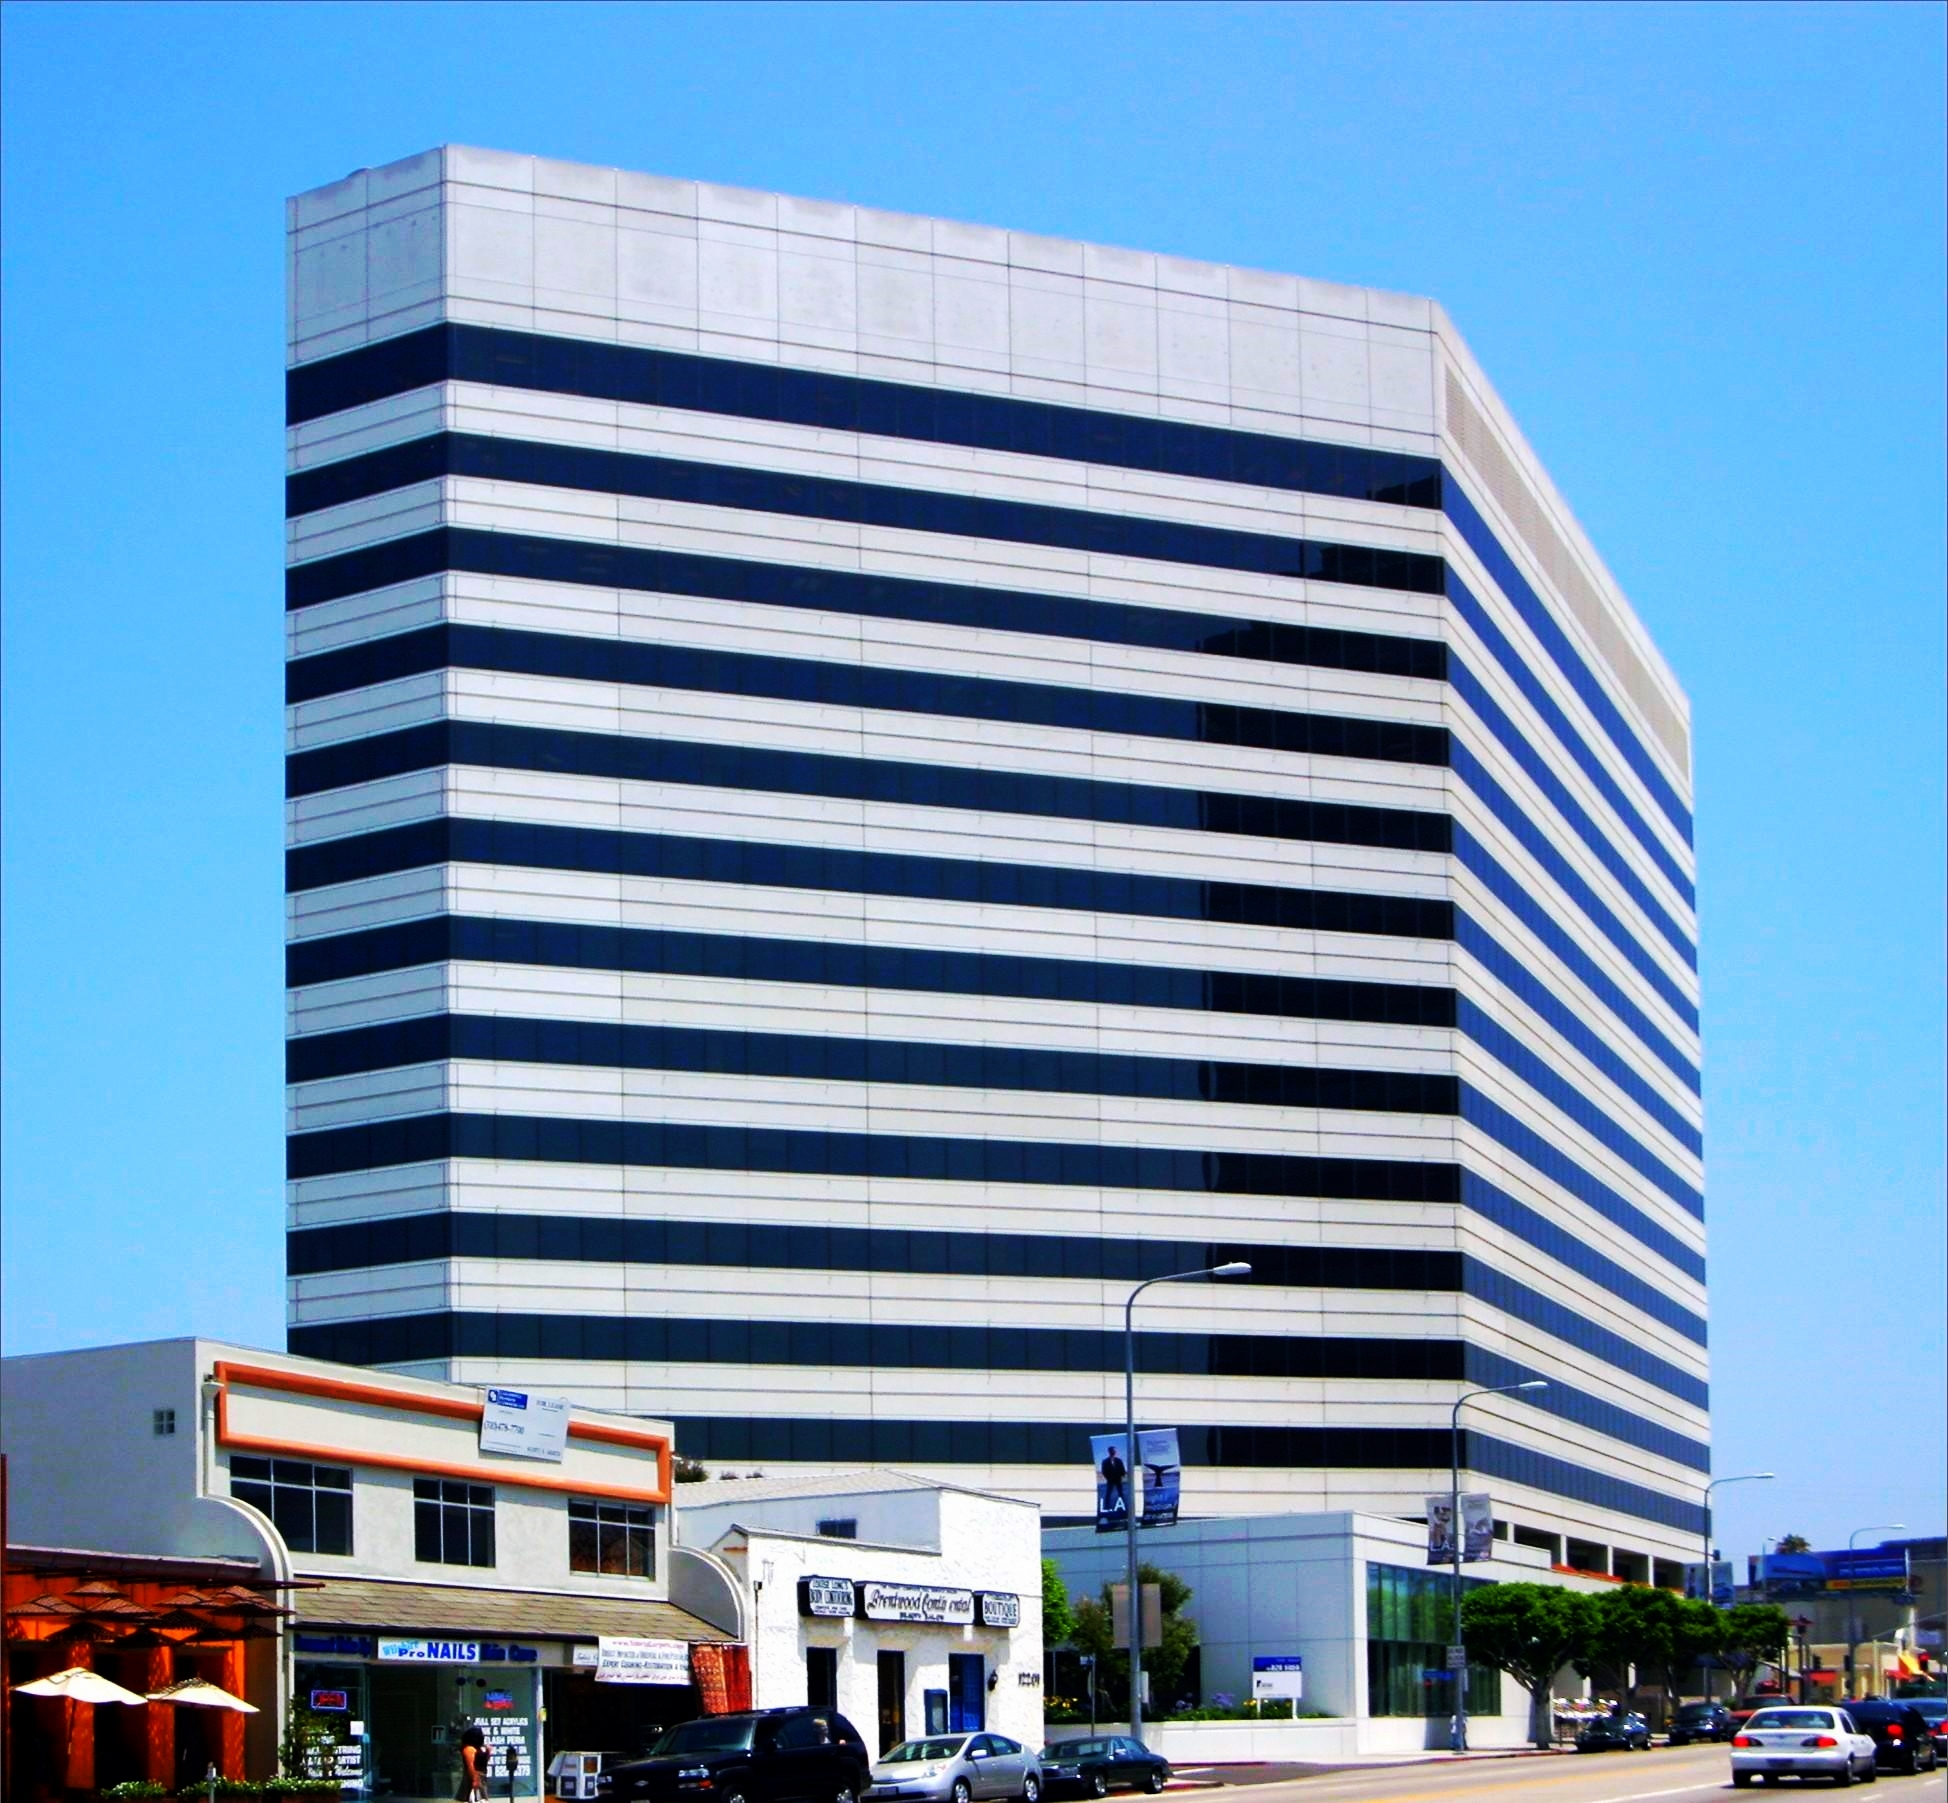 12121 Wilshire Blvd, Los Angeles, CA